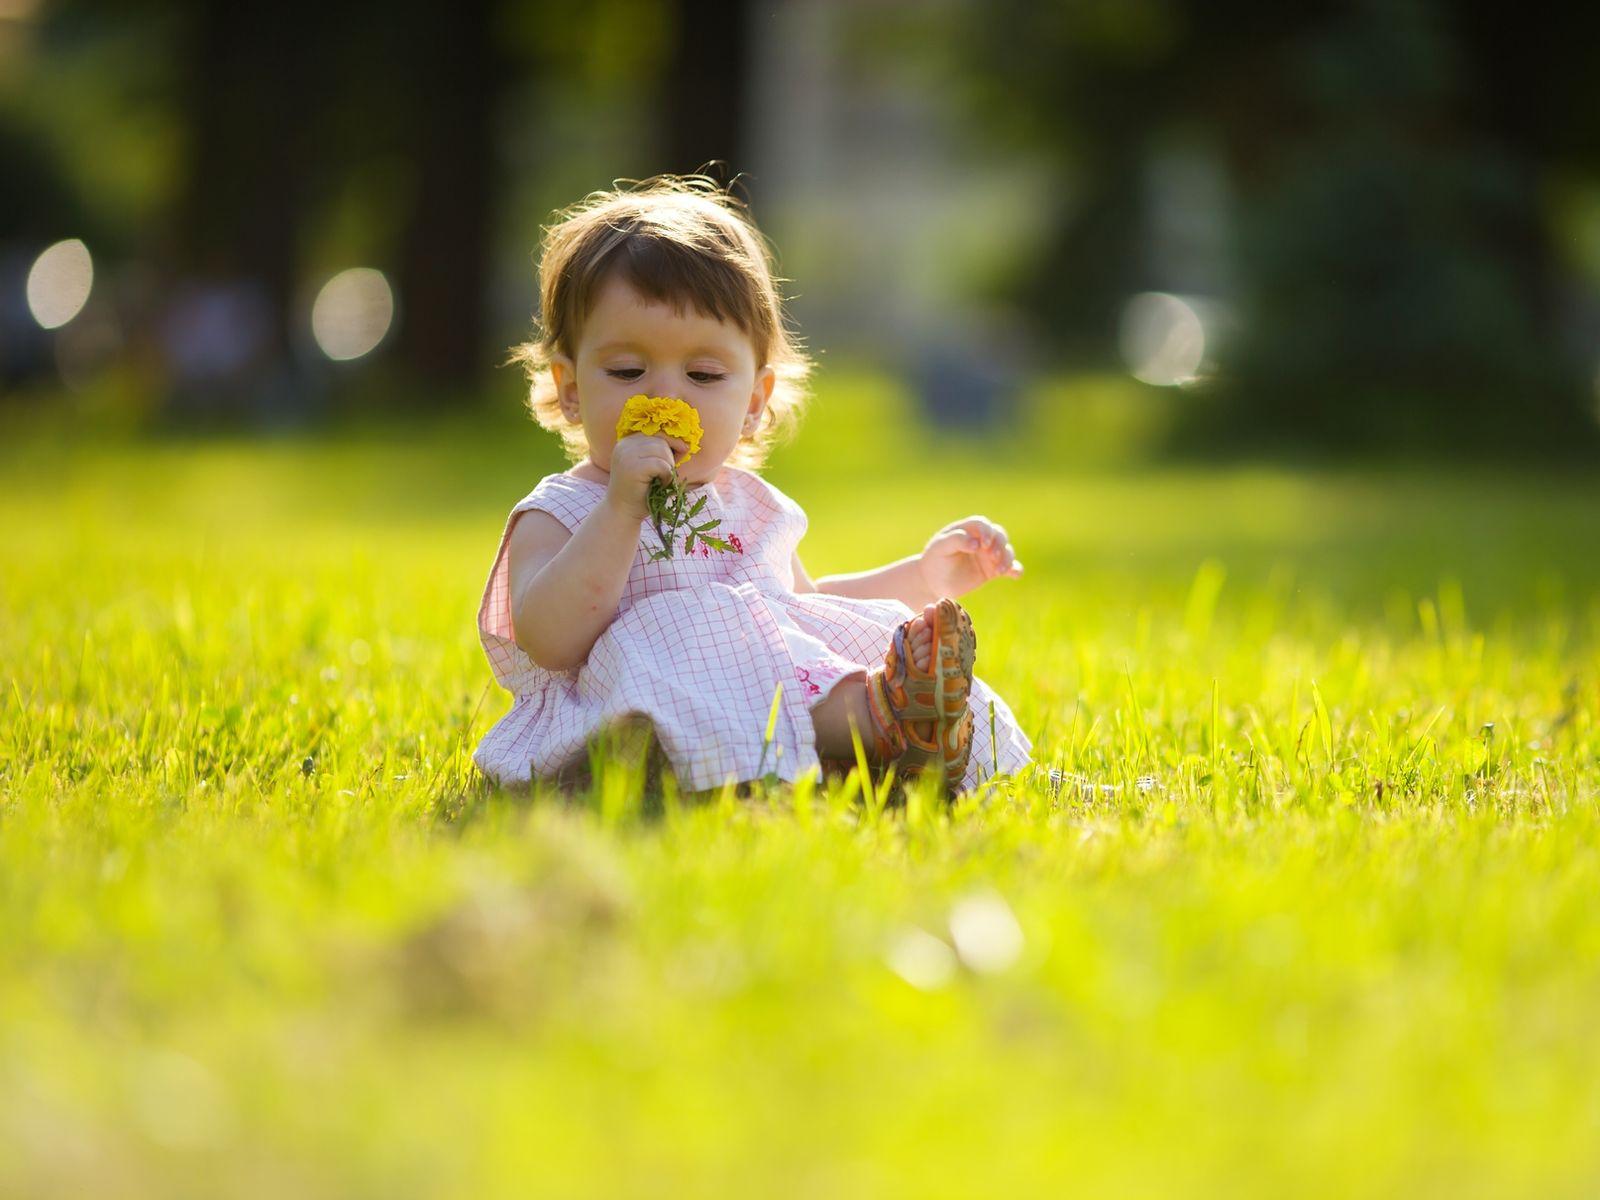 Как защитить малыша от жары